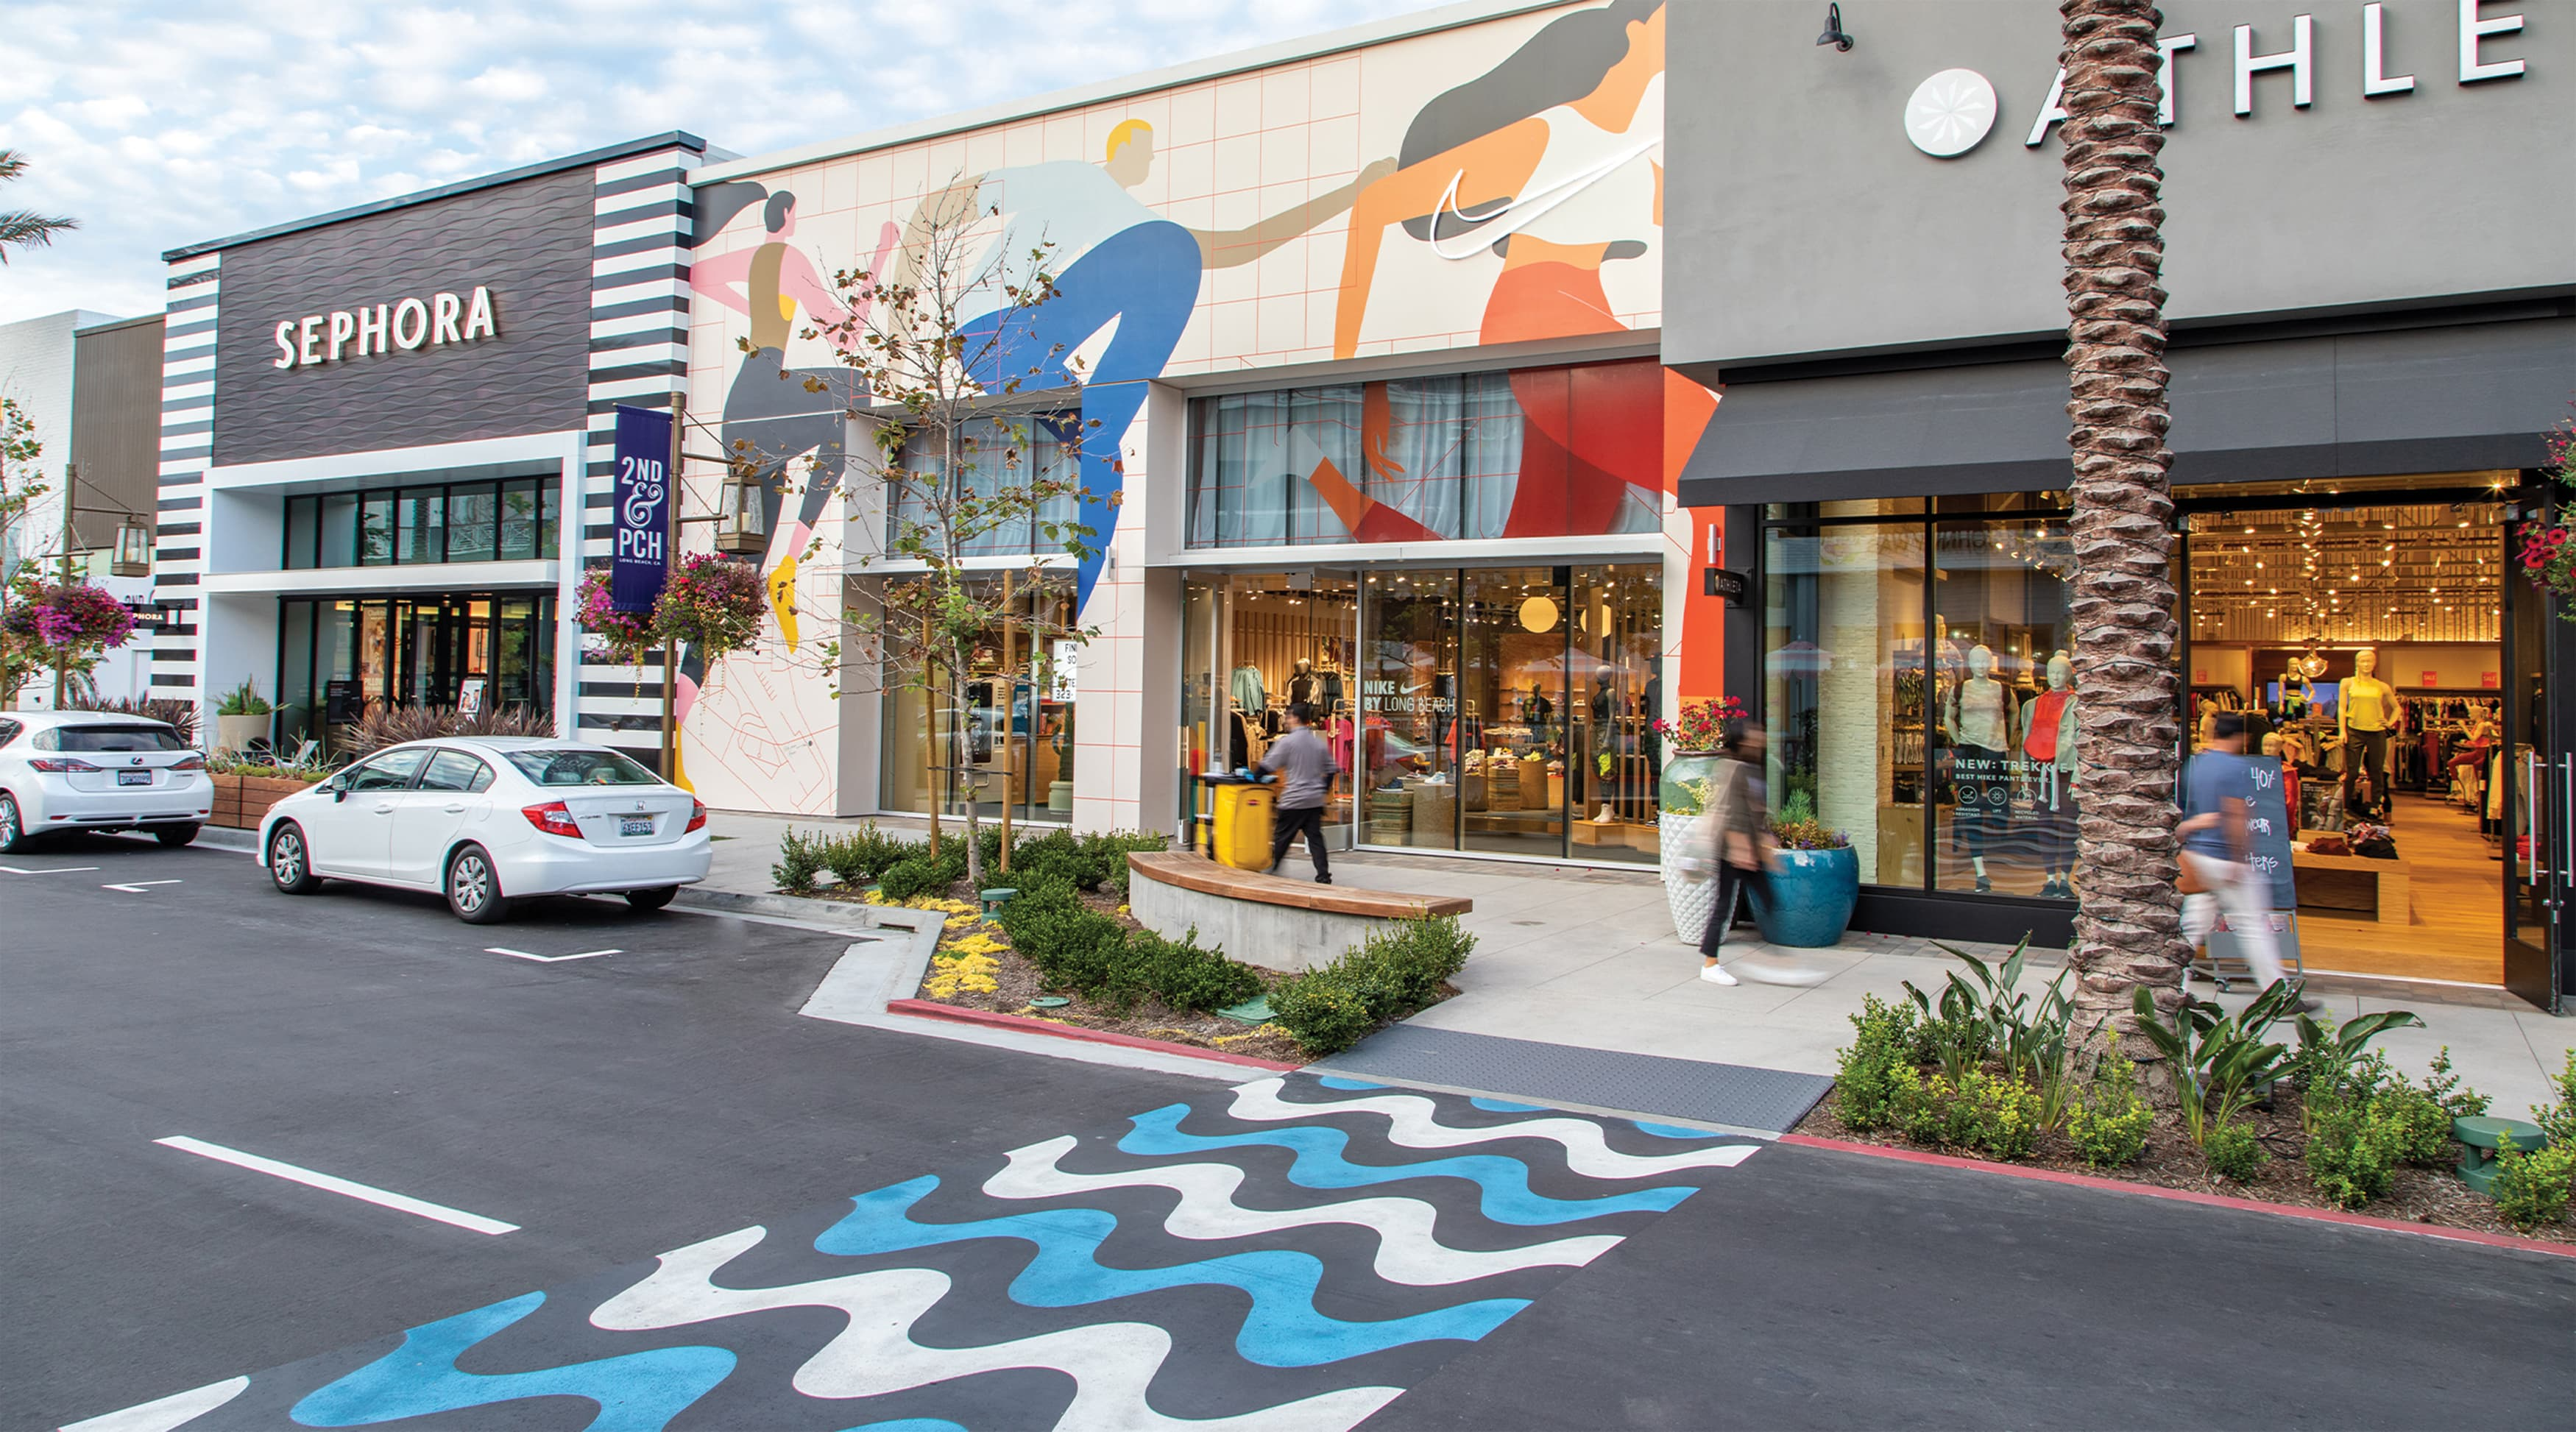 2nd & PCH storefront mural design and custom crosswalk esign